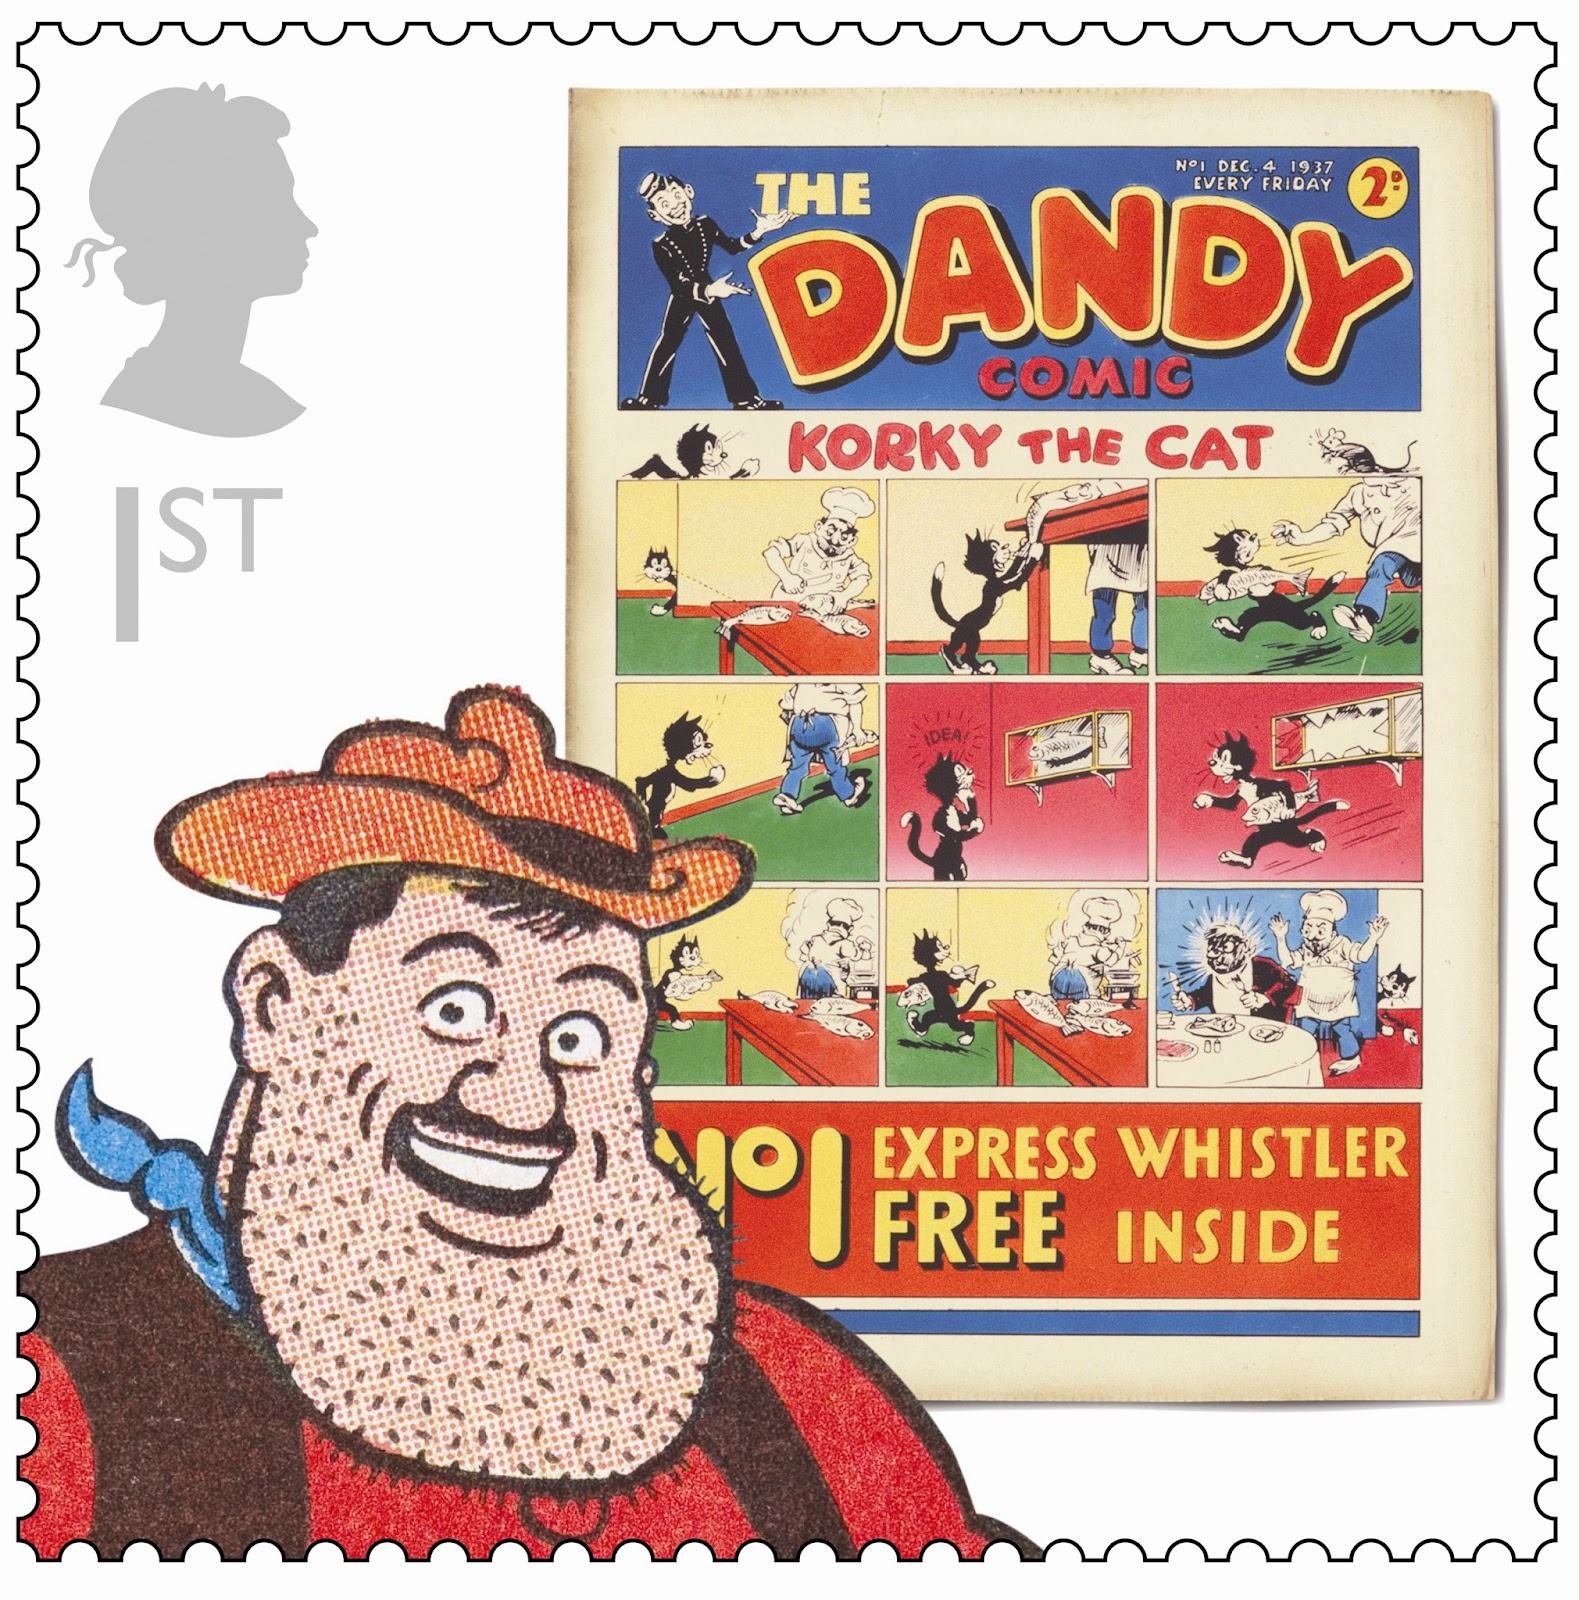 downthetubes.net news blog: British Comics Stamps Launch ...